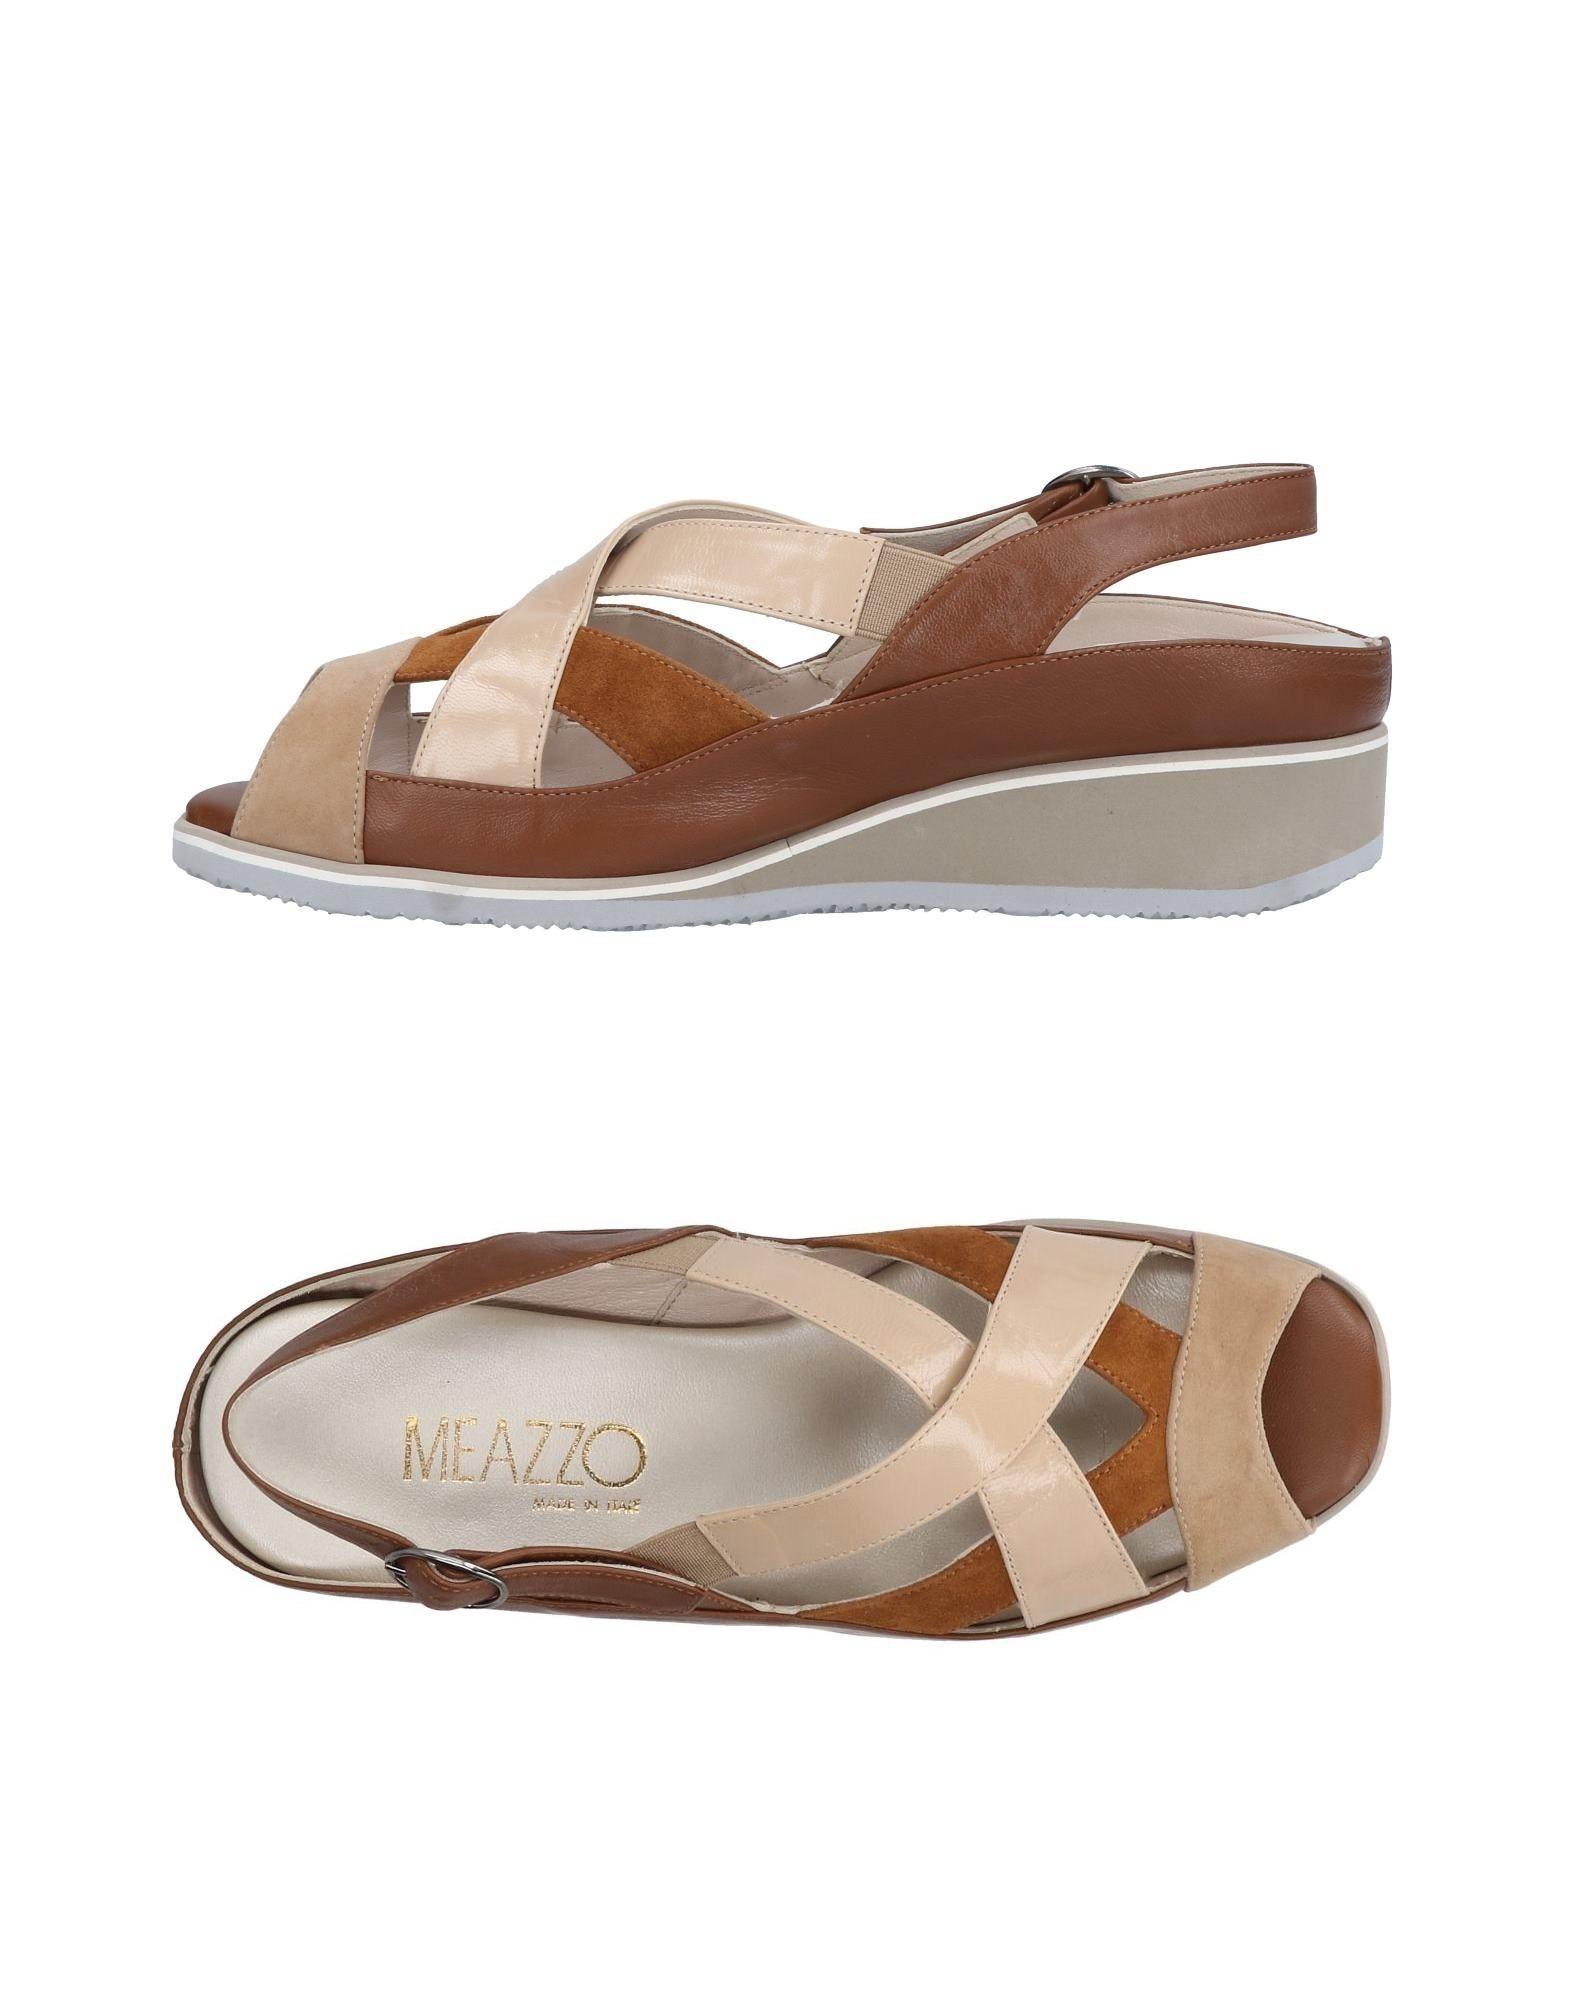 Sandali Meazzo Donna - 11481847SC elegante